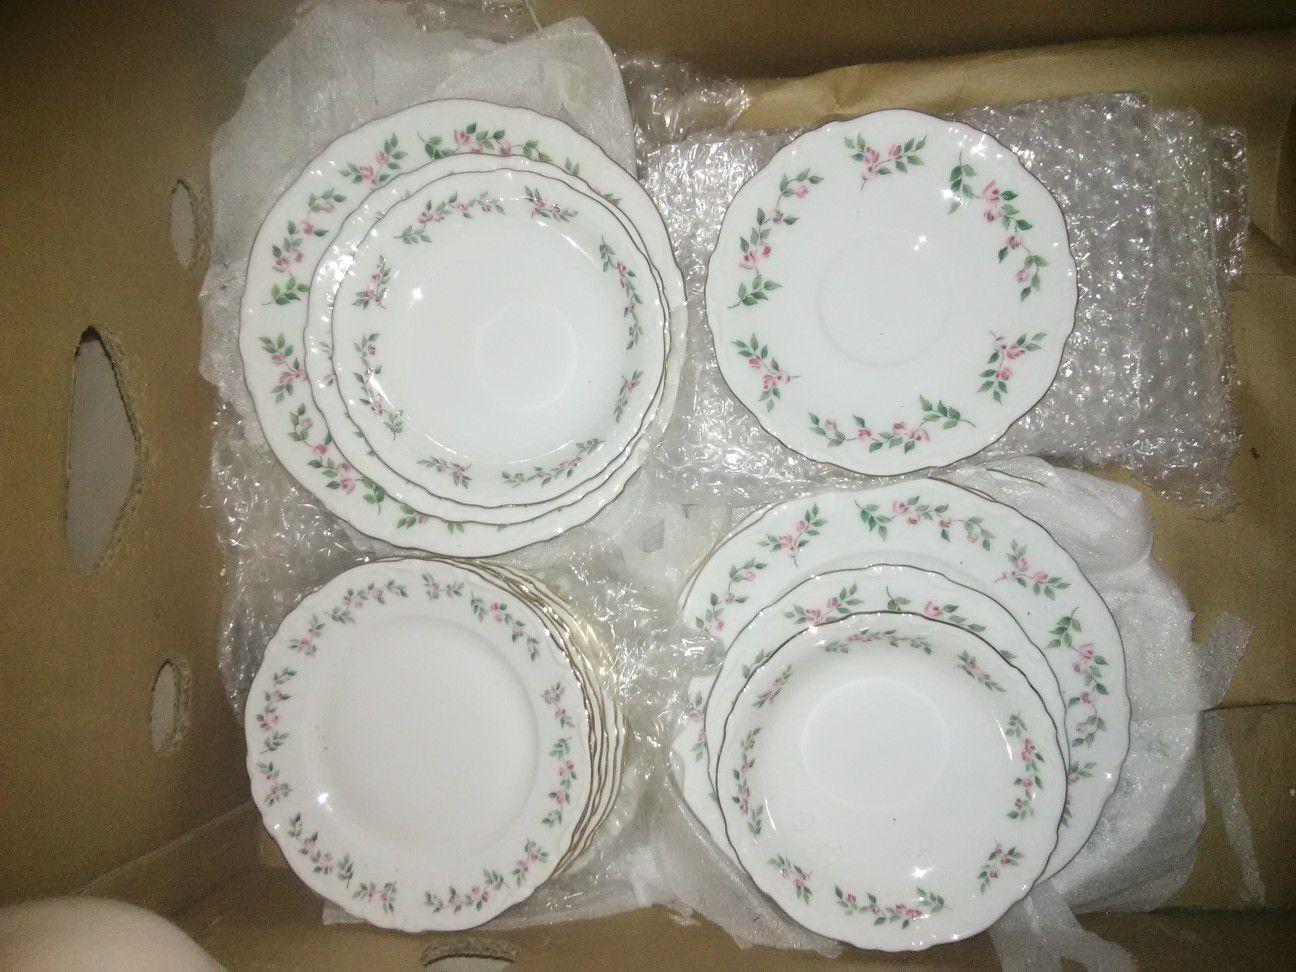 Crown Bavarian china